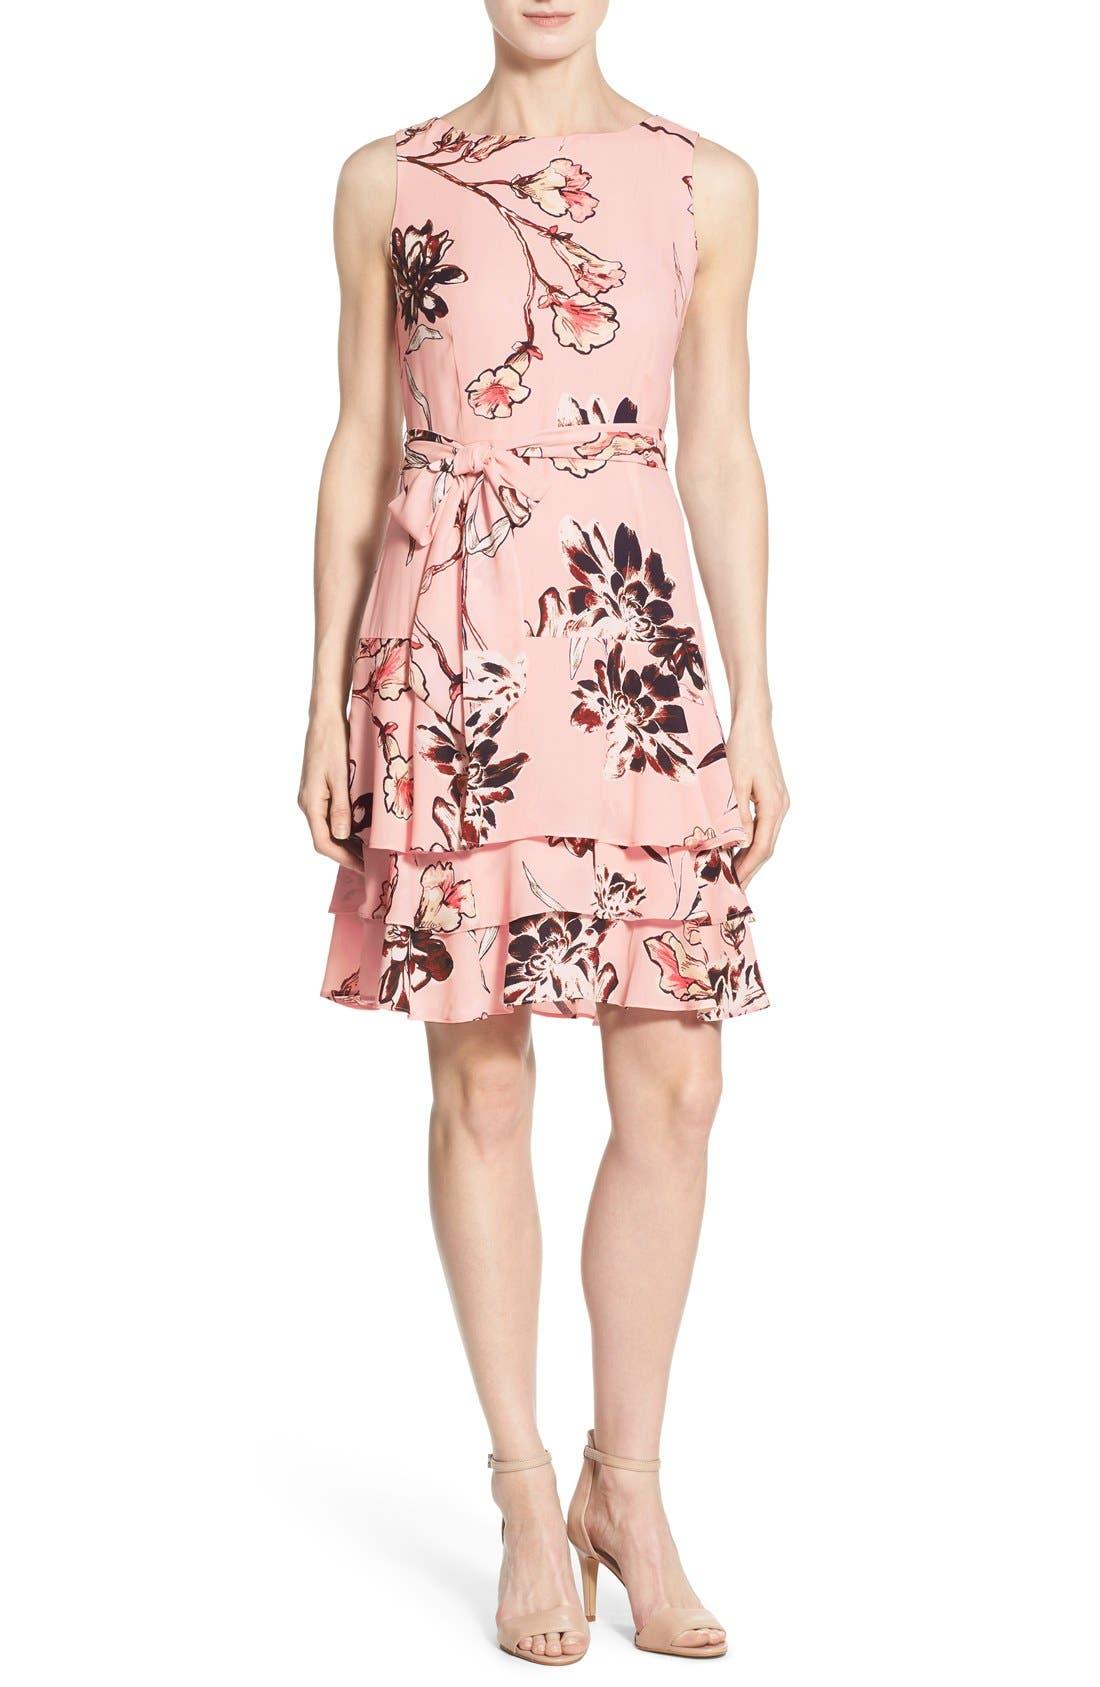 Alternate Image 1 Selected - Ivanka Trump Floral Print Tiered A-Line Dress